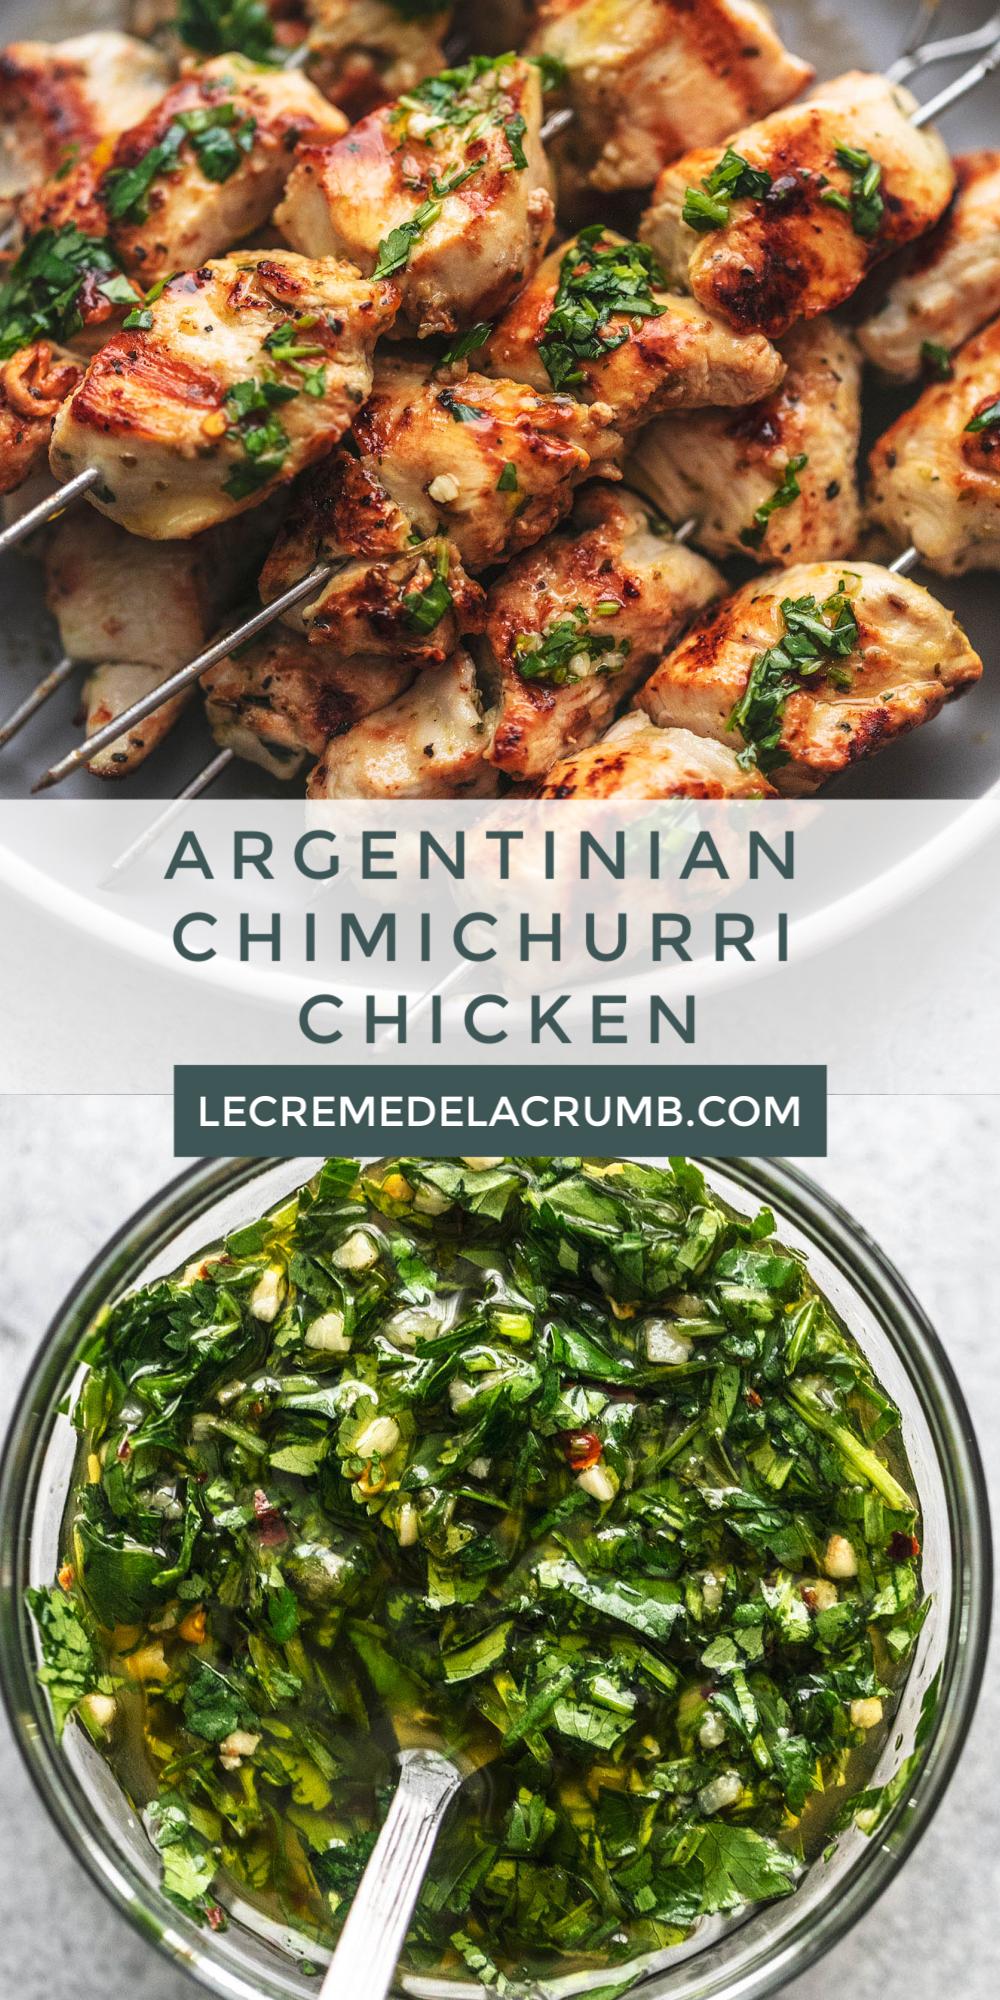 Argentinian Chimichurri Chicken